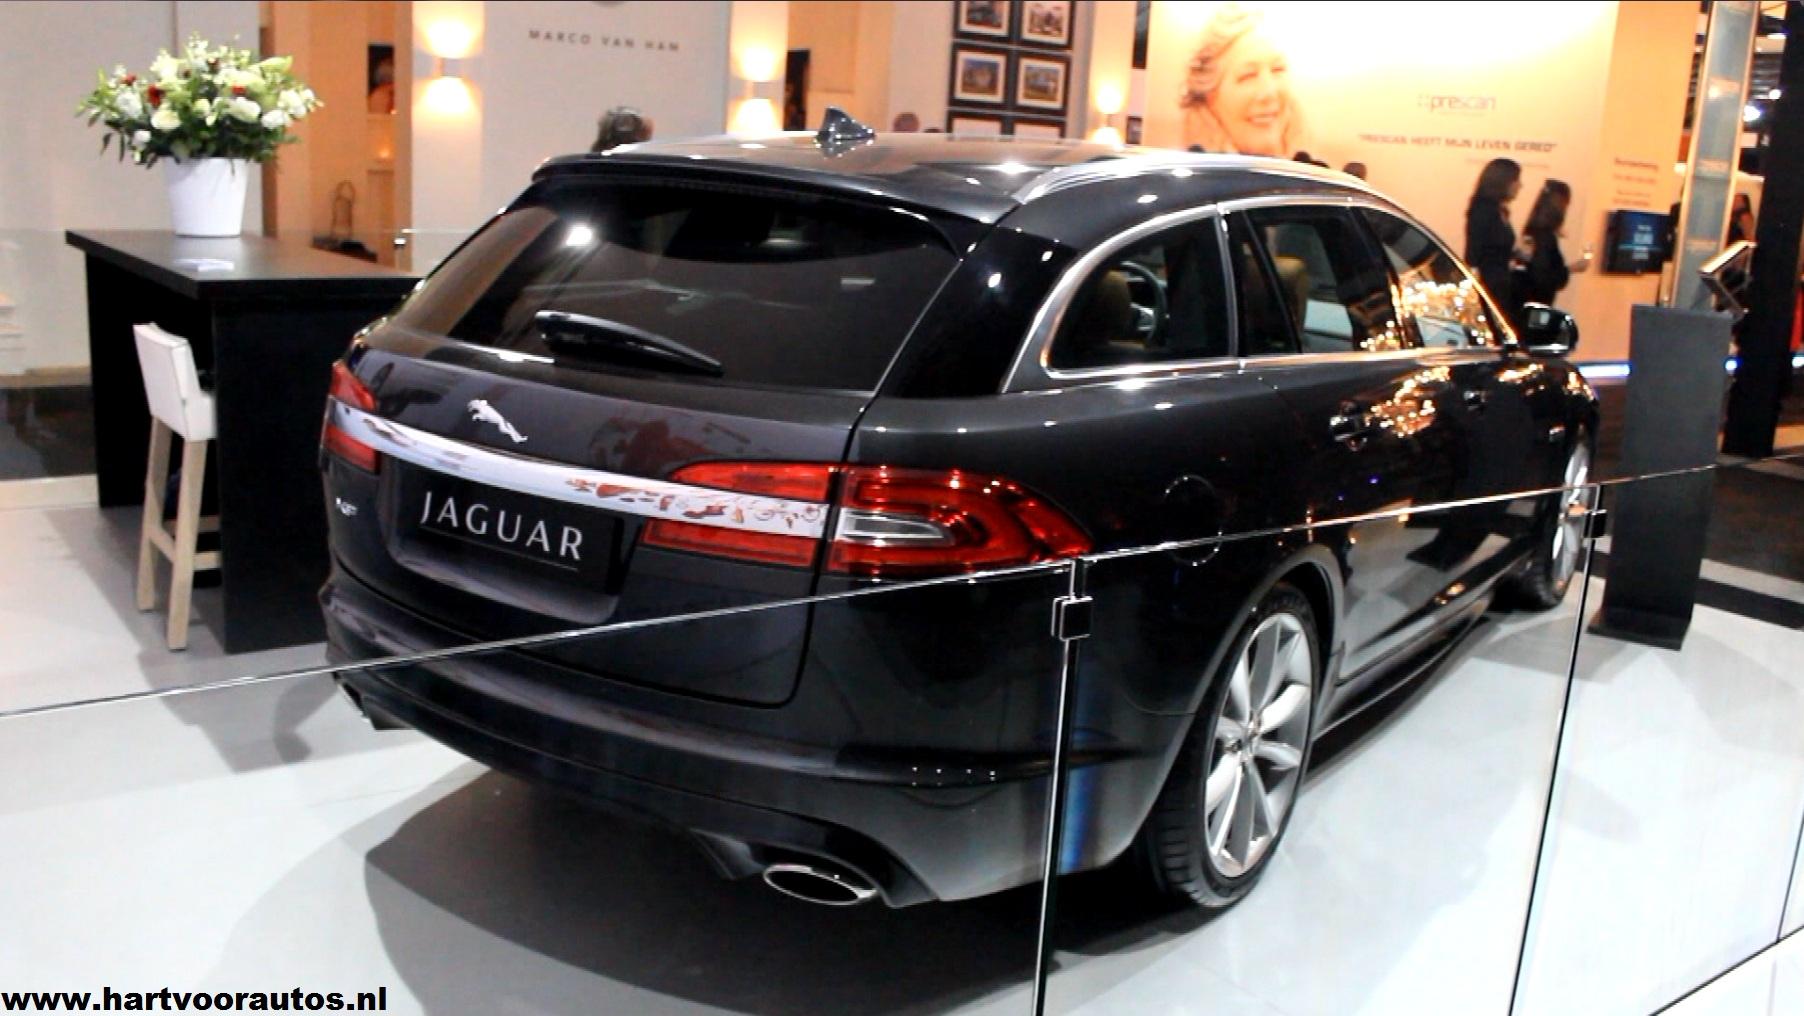 Jaguar XF Shooting Brake - www.hartvoorautos.nl